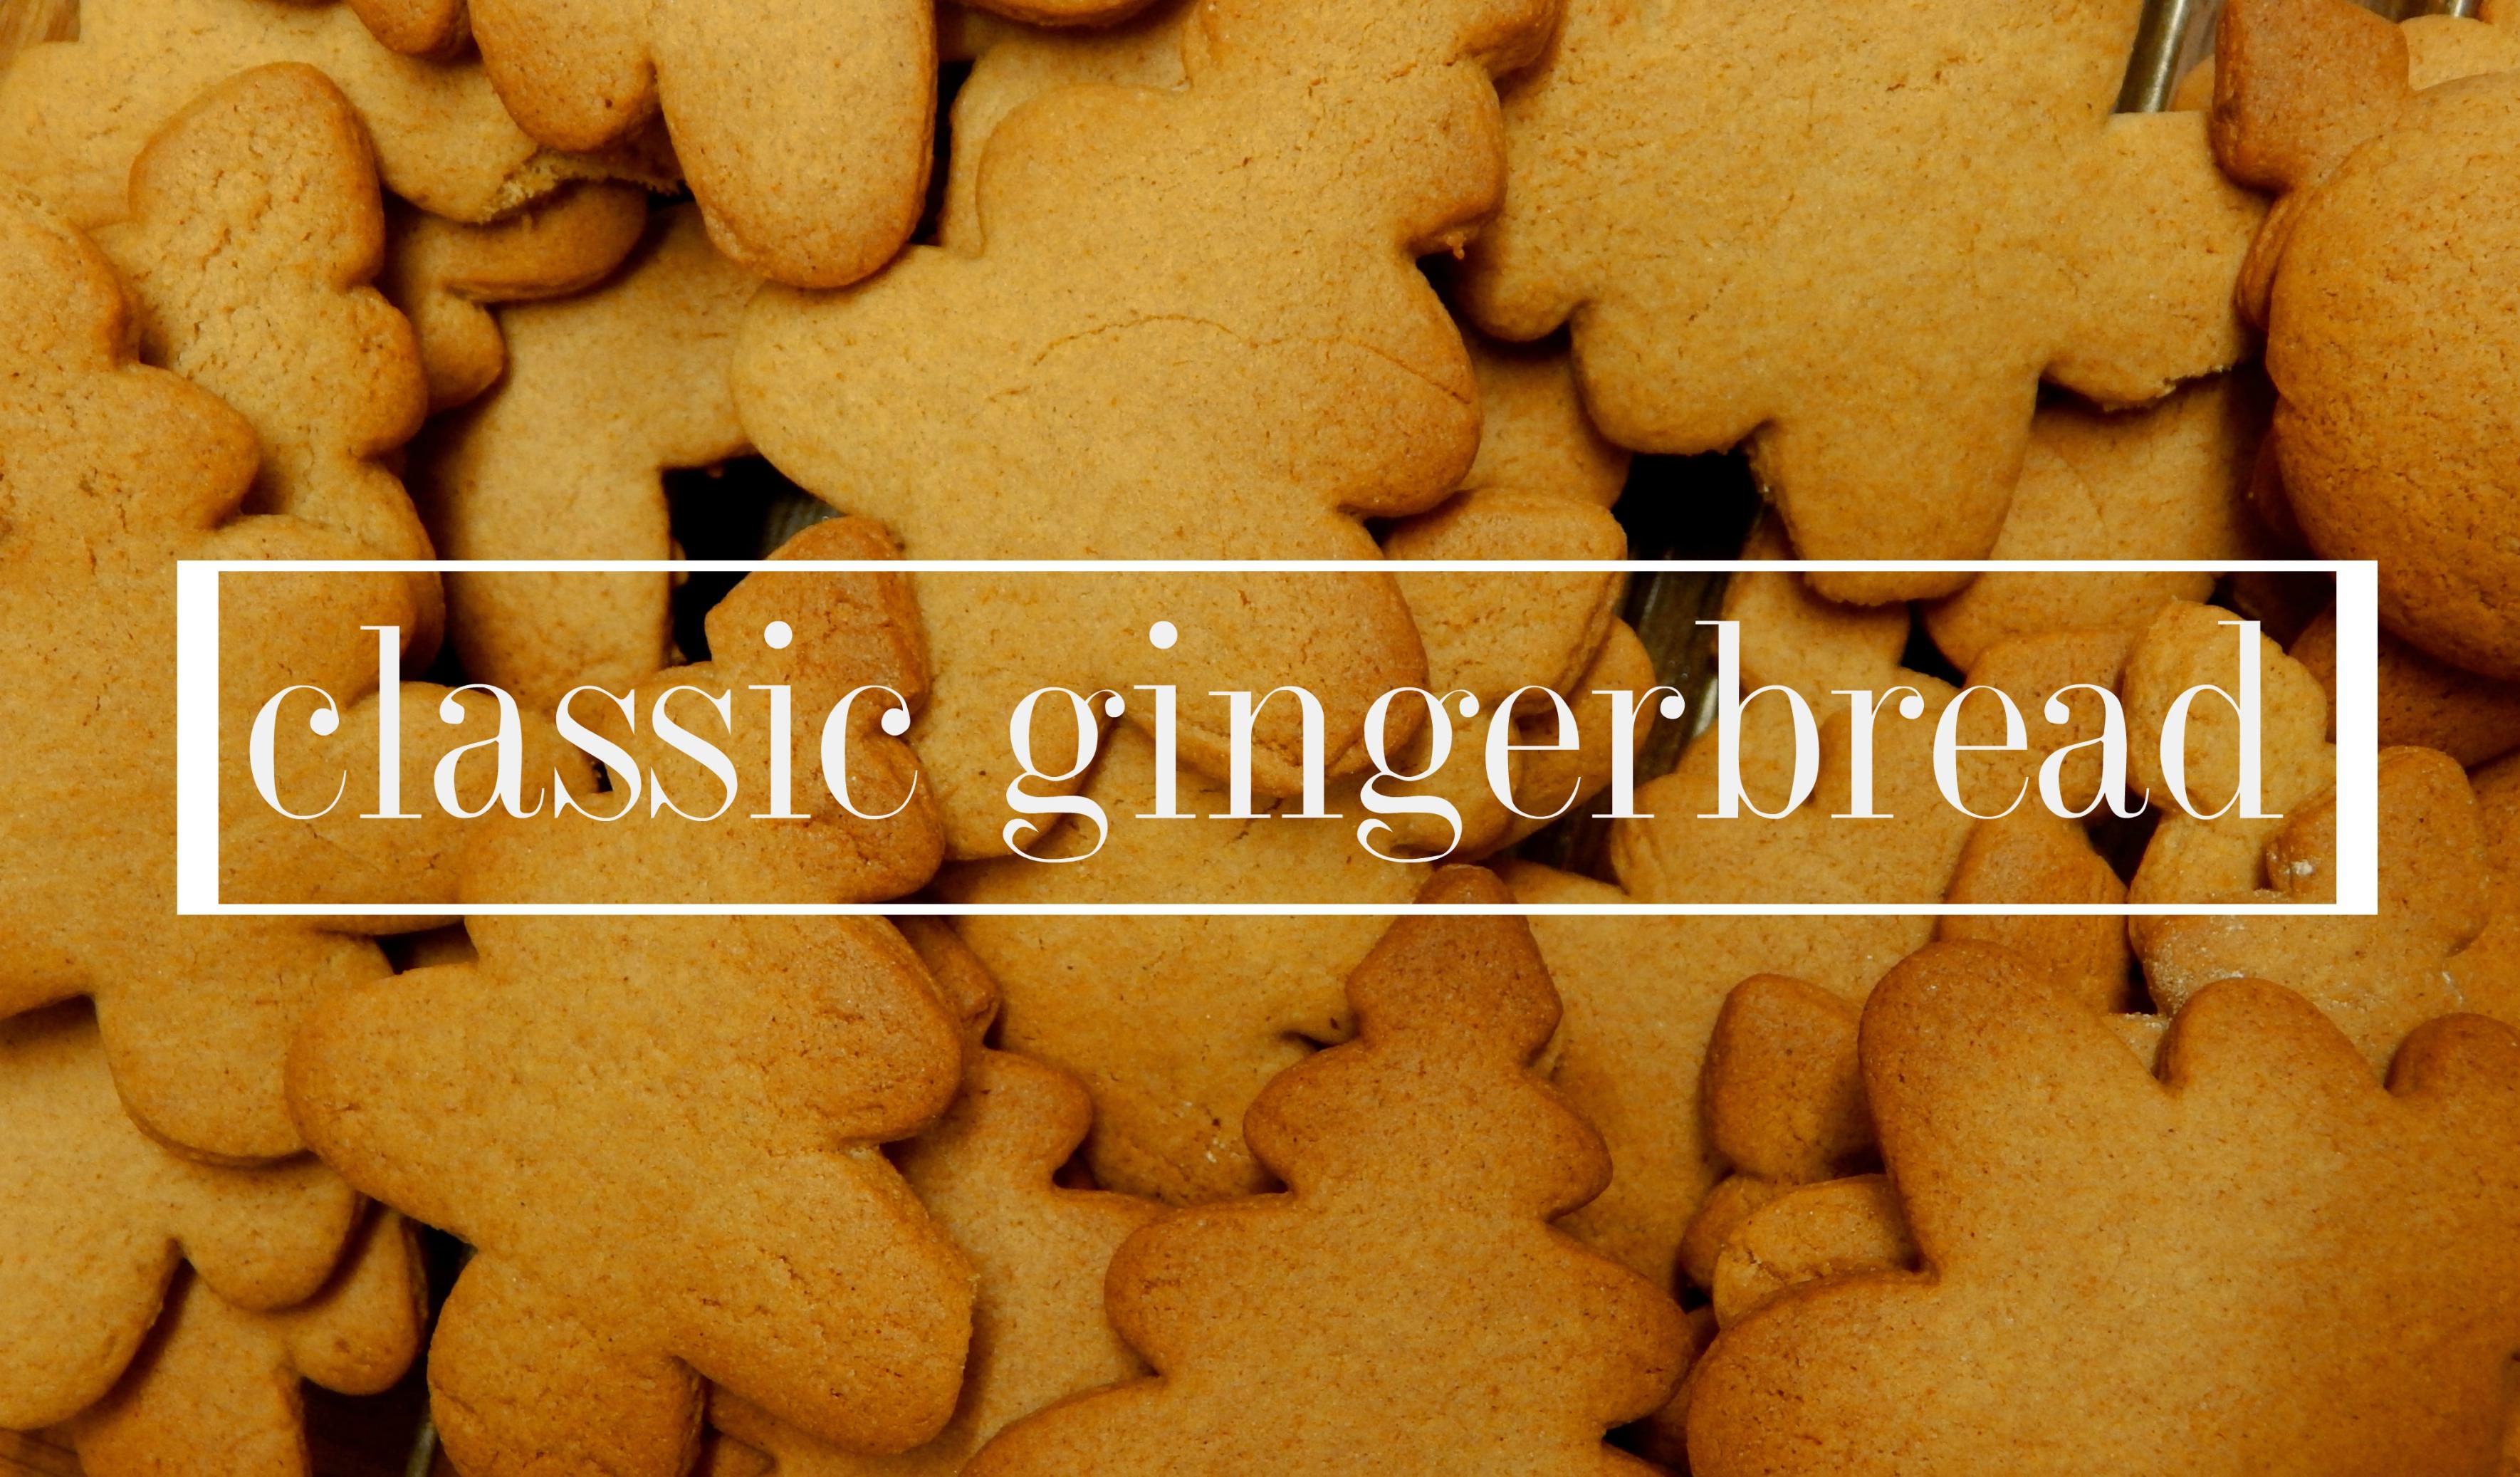 classic gingerbread